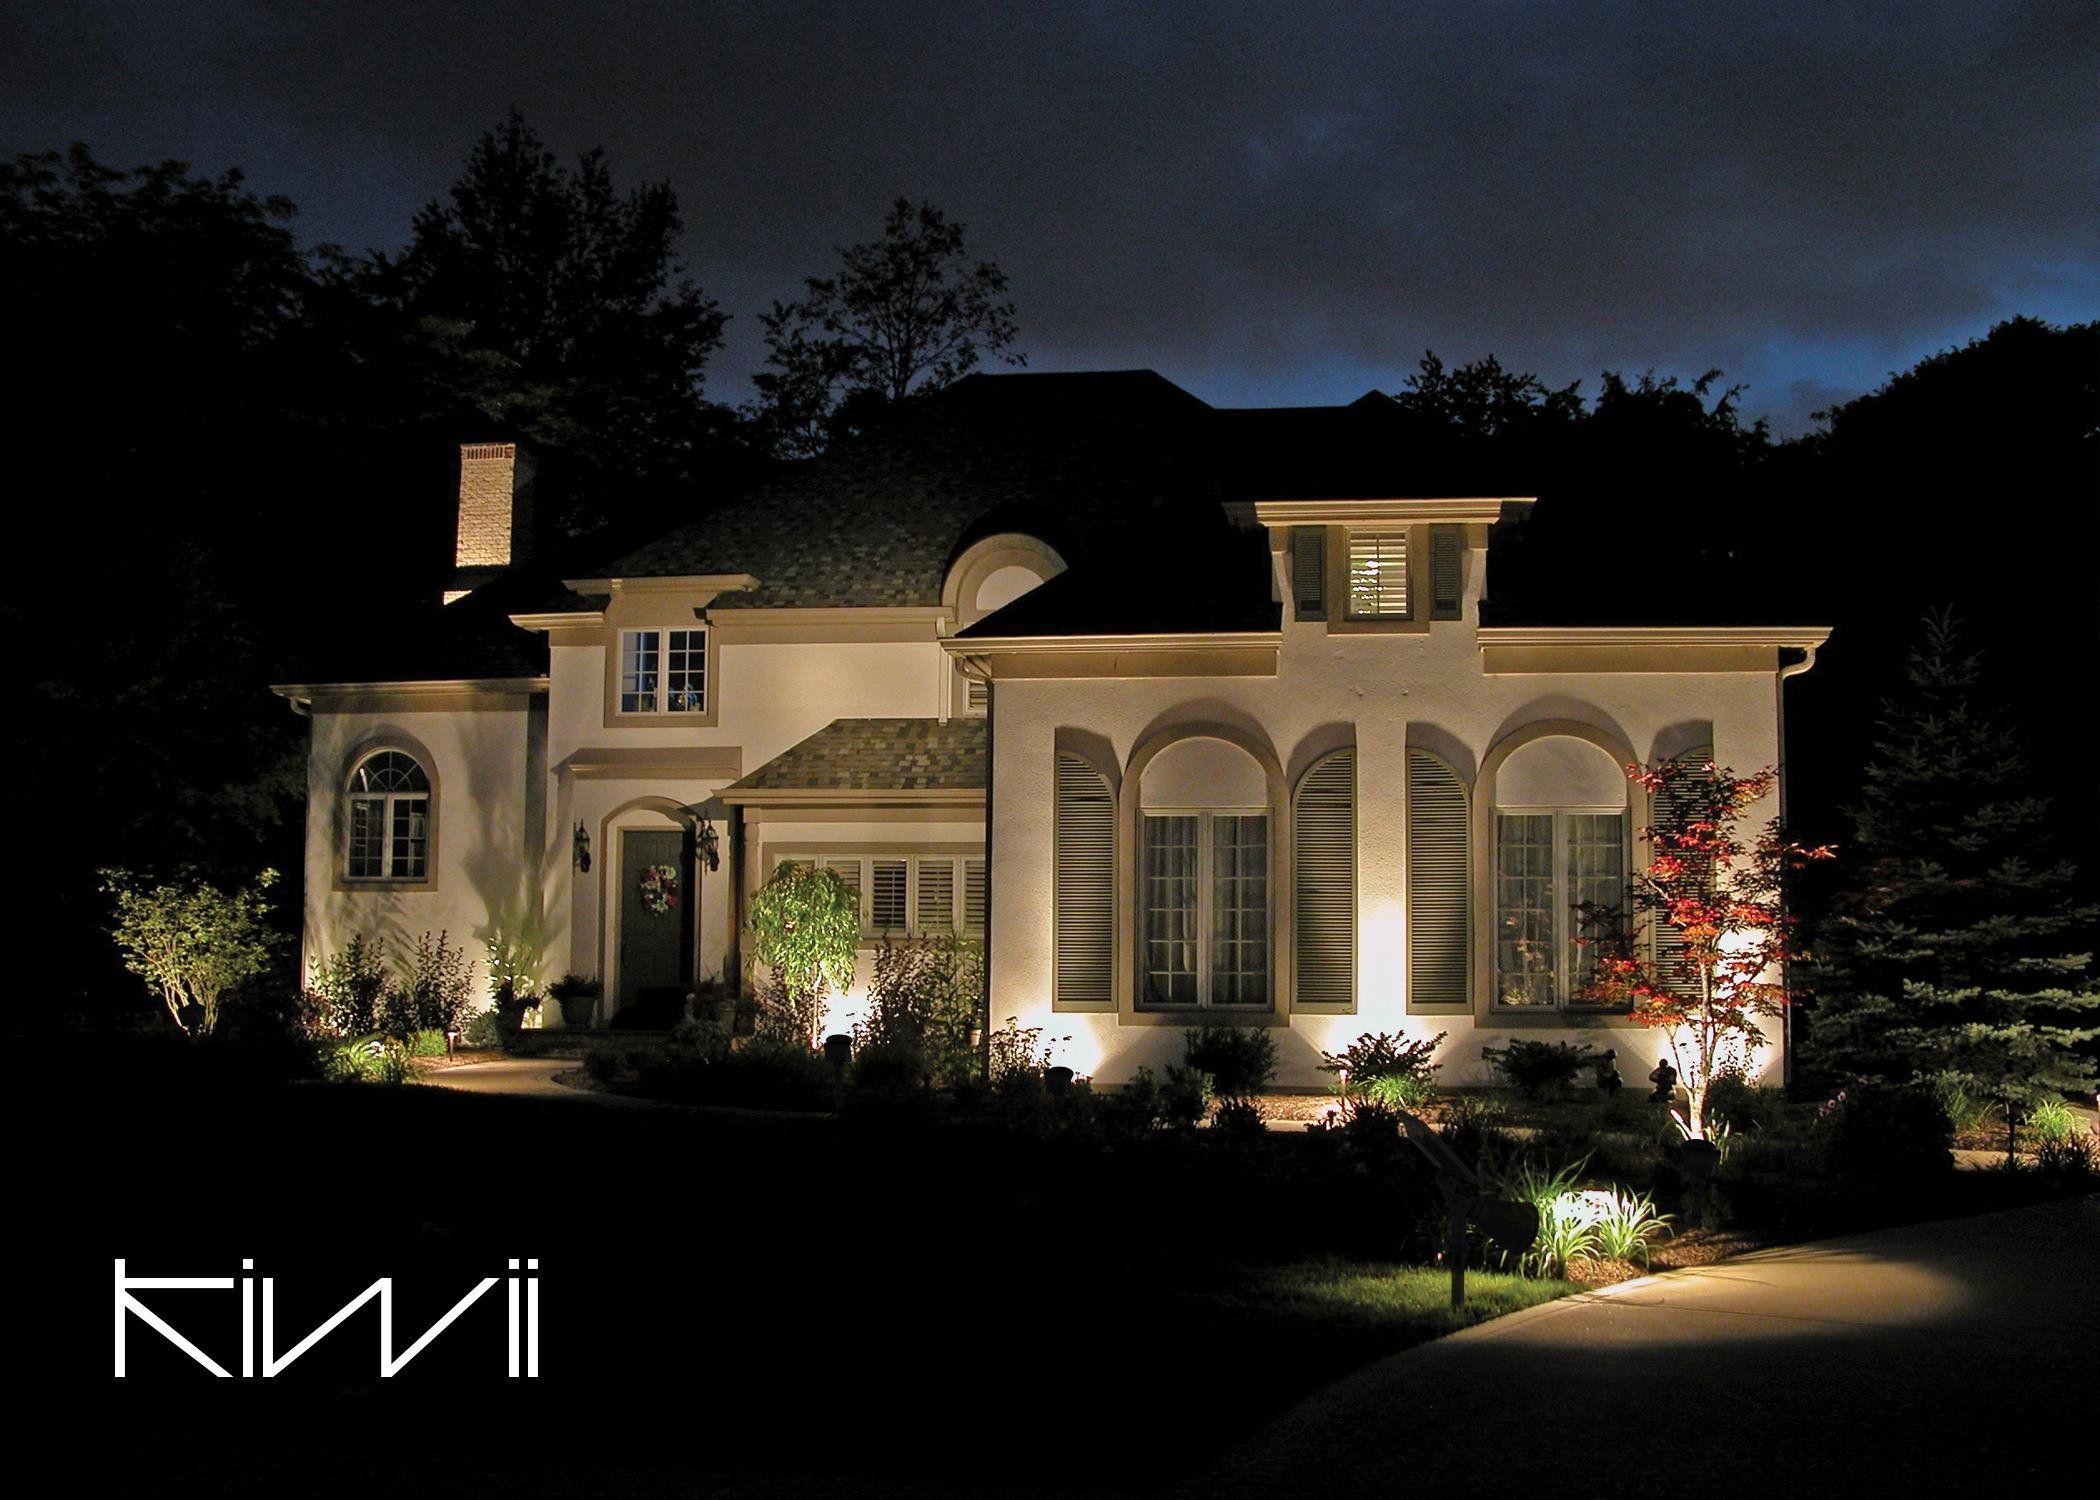 2bd5046113c7b04ccb16cf902a11add1 - Better Homes And Gardens Solar Spot Lights